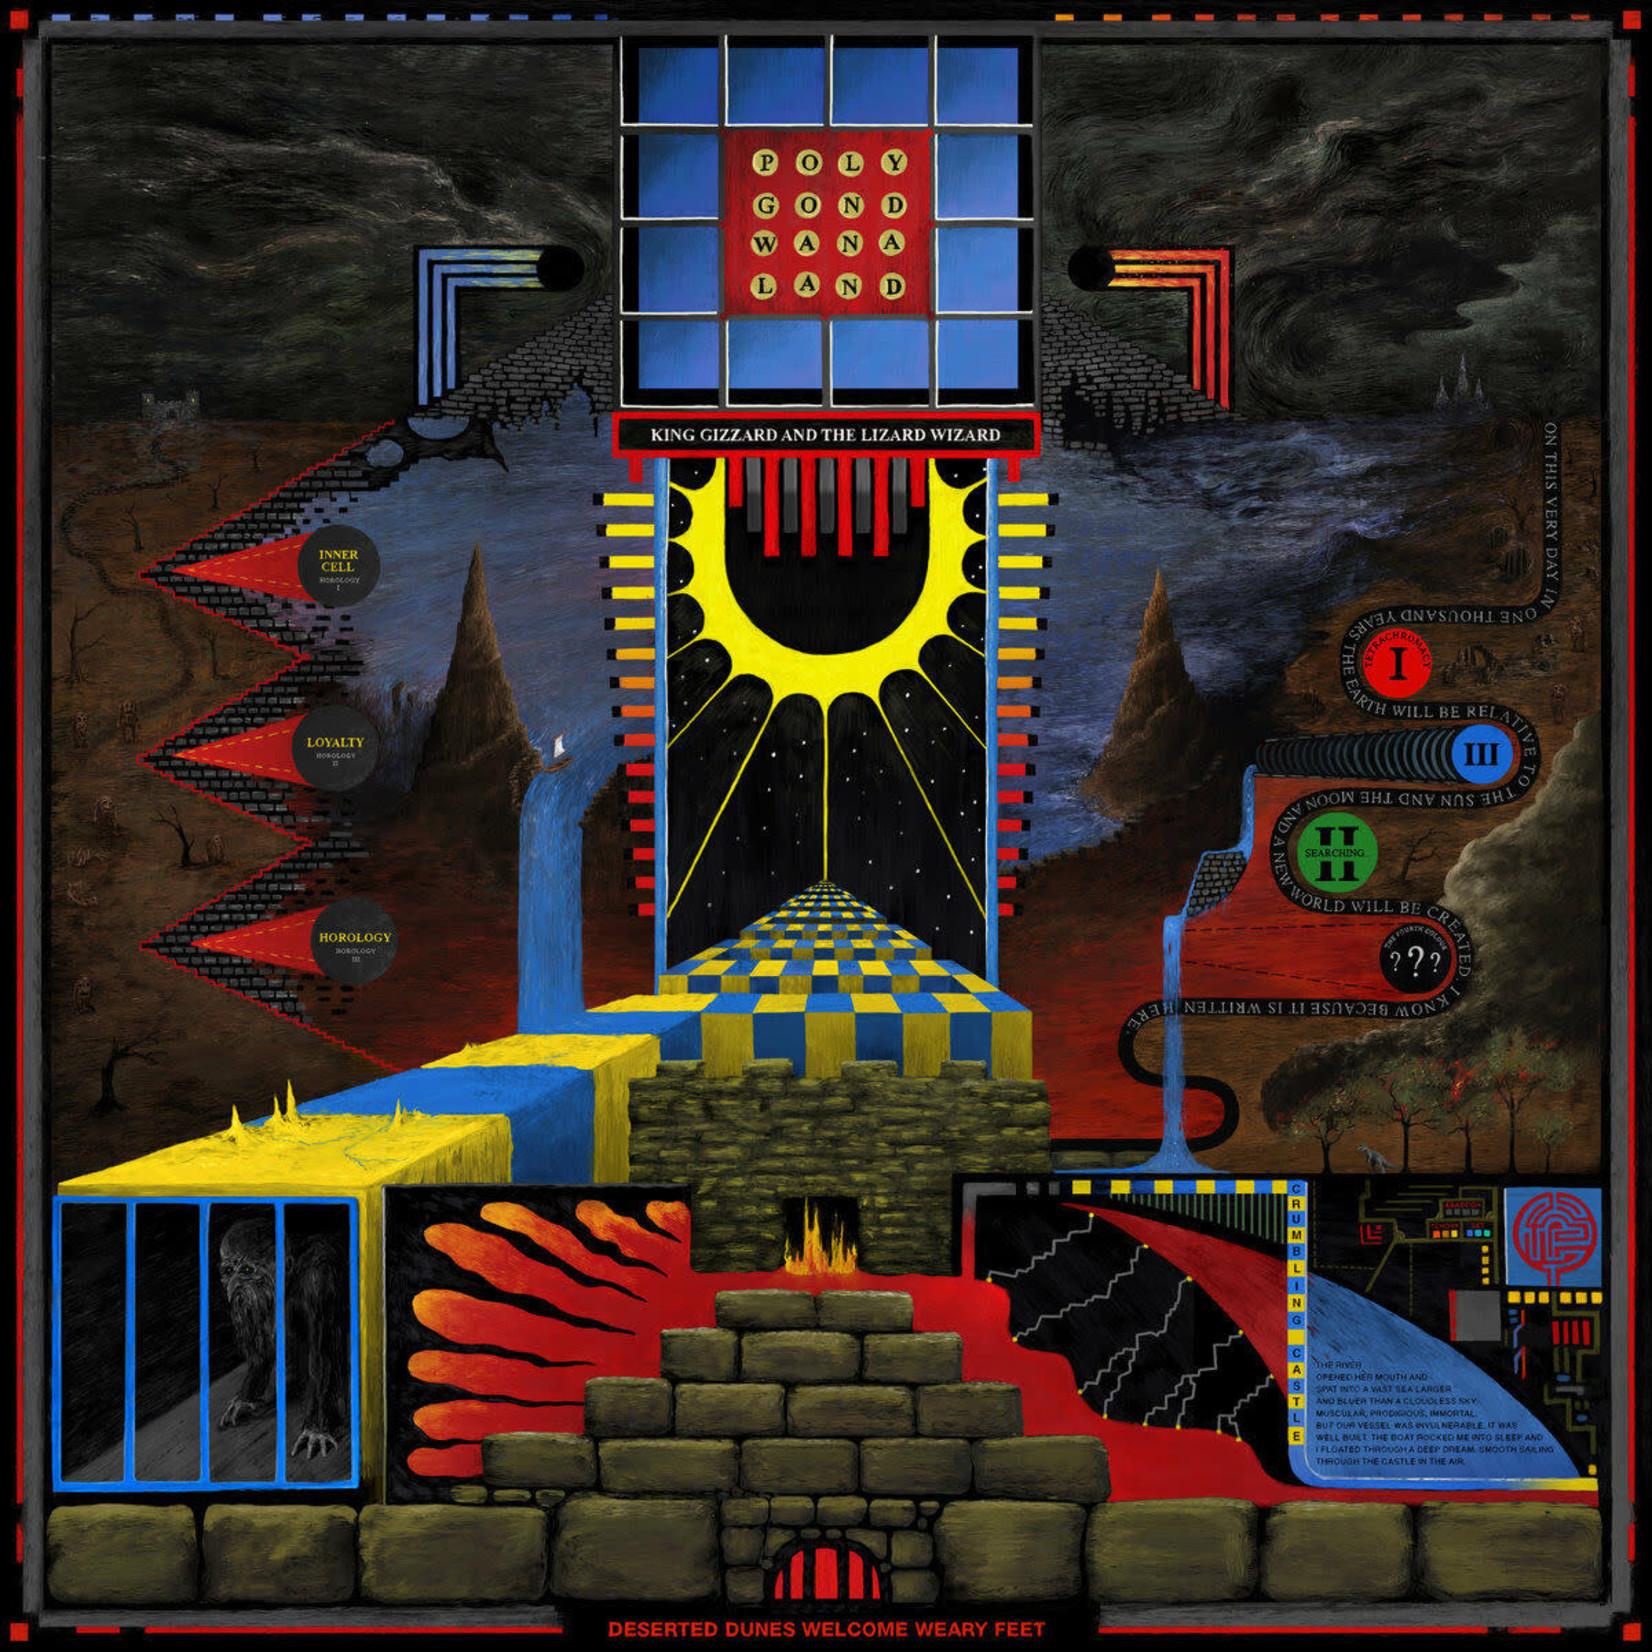 [New] King Gizzard & the Lizard Wizard: Polygondwanaland (Limited Ed., multicoloured vinyl)